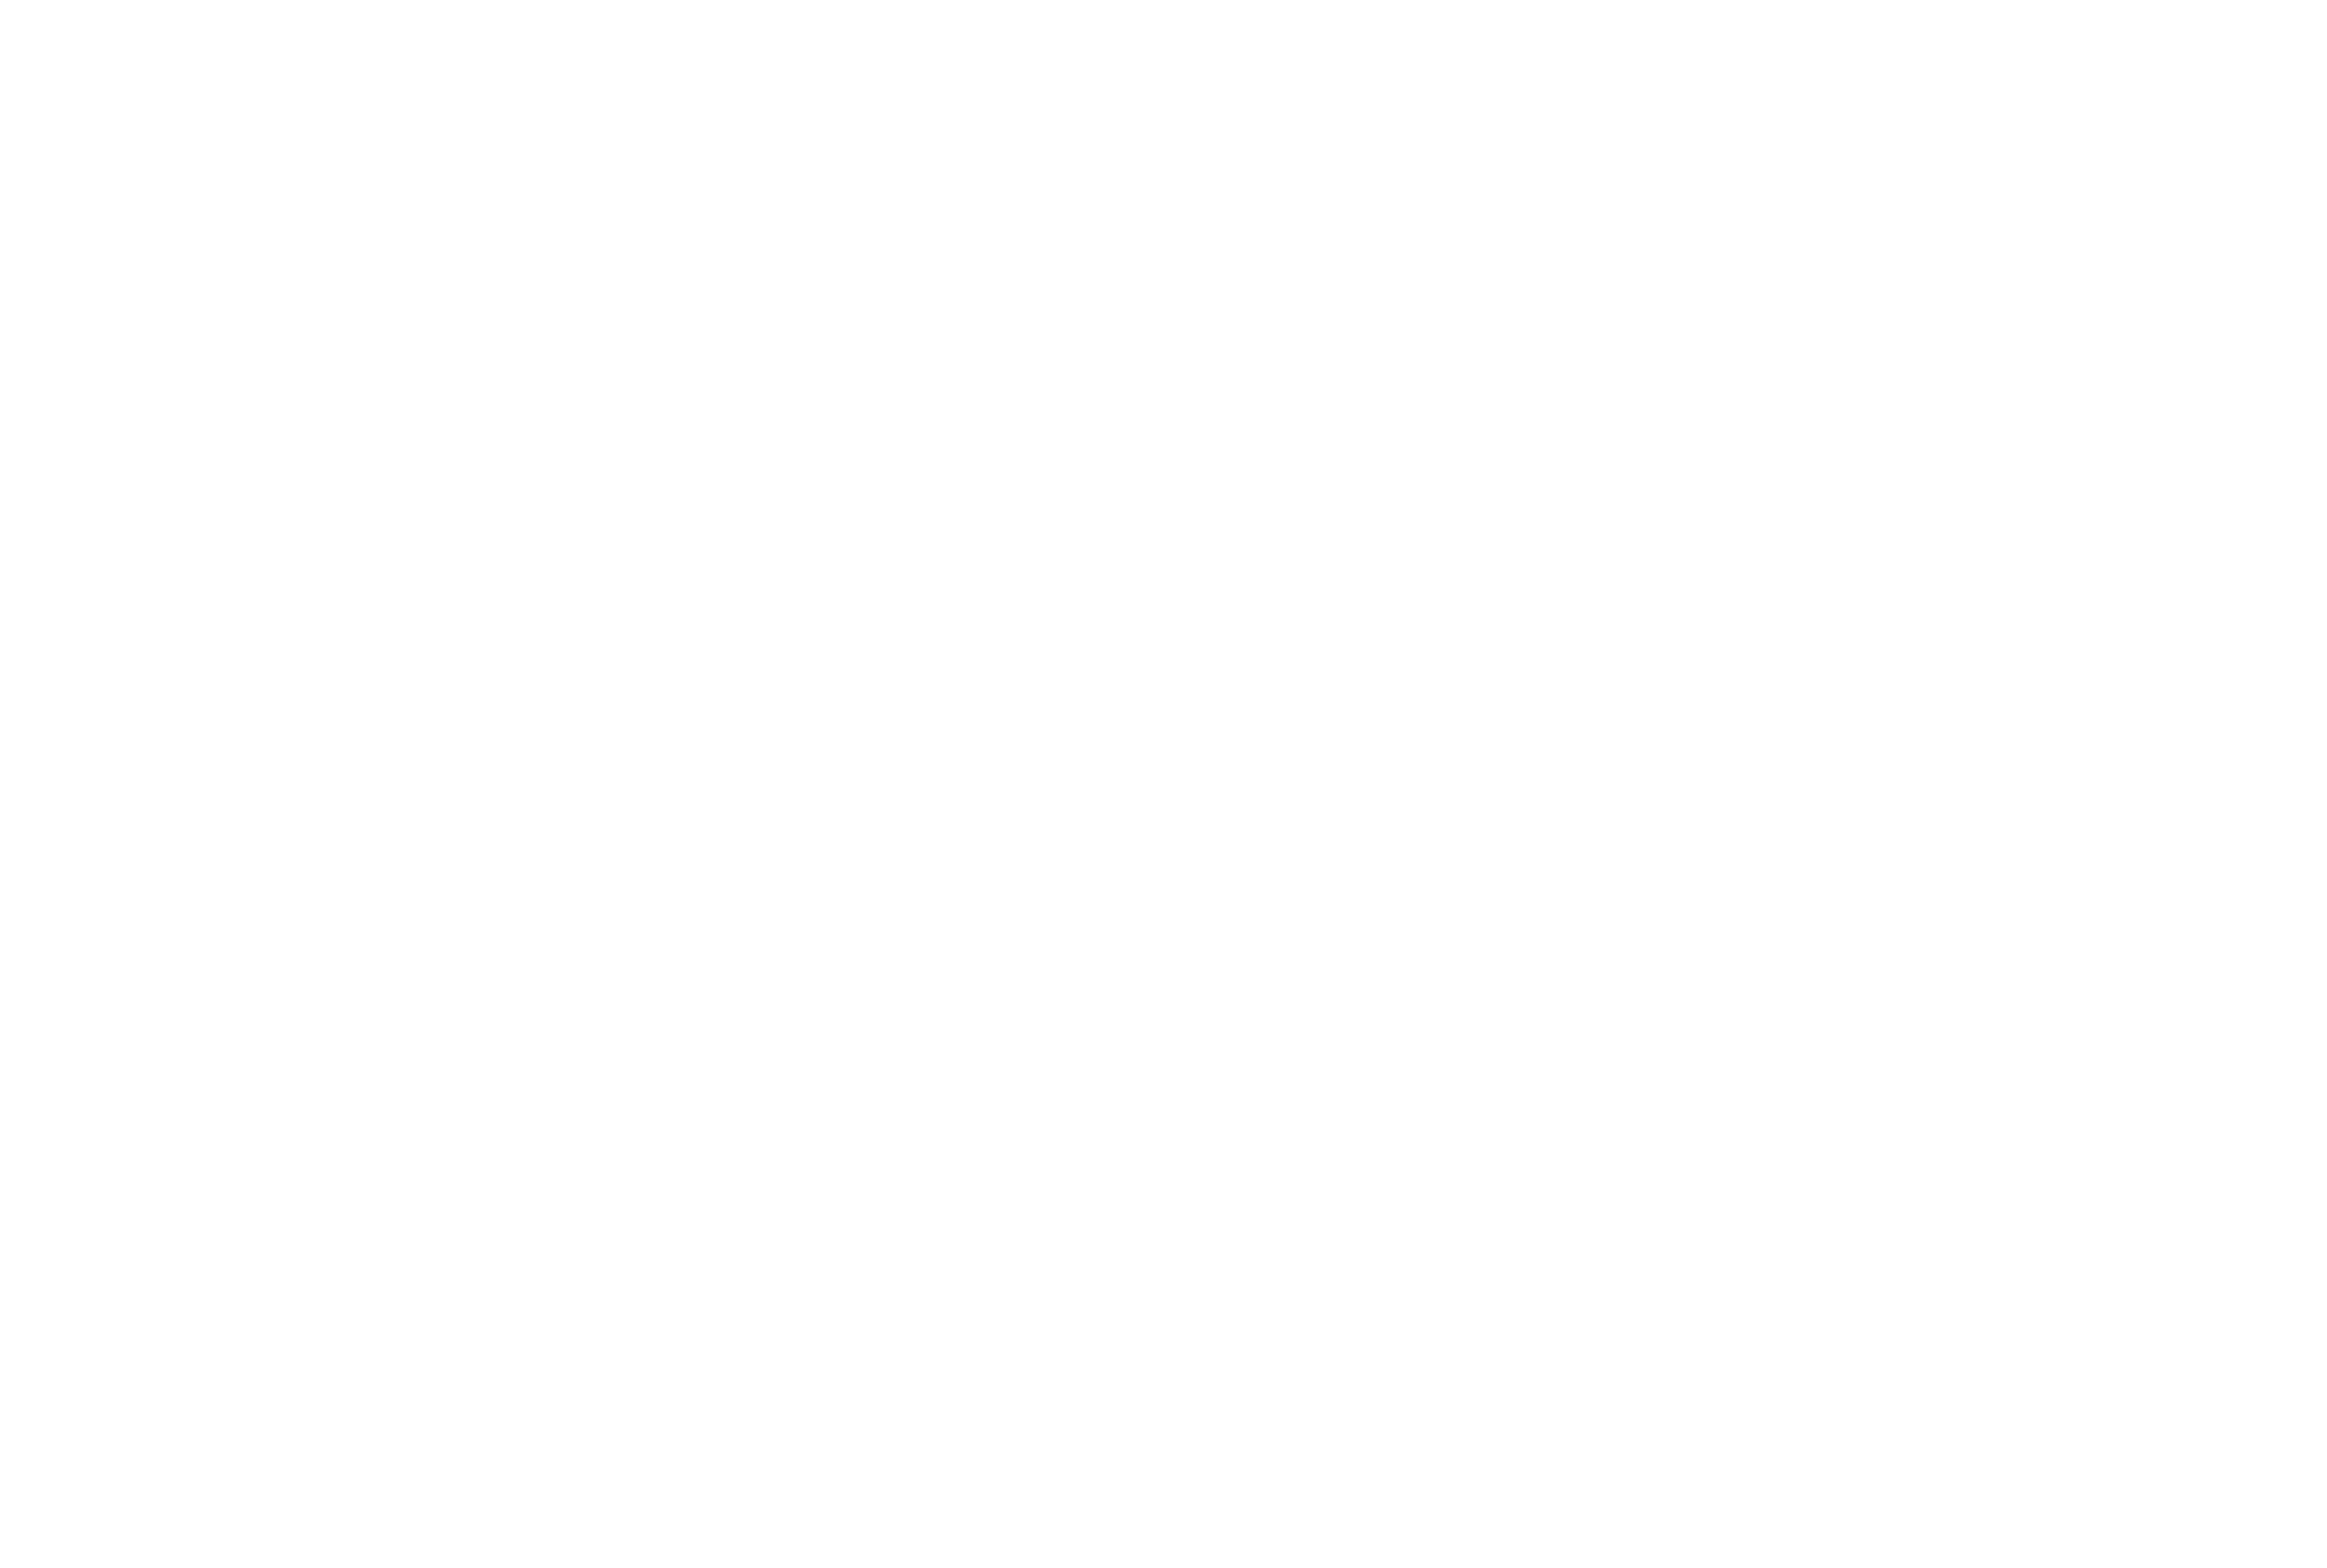 Aravis Holidays Location